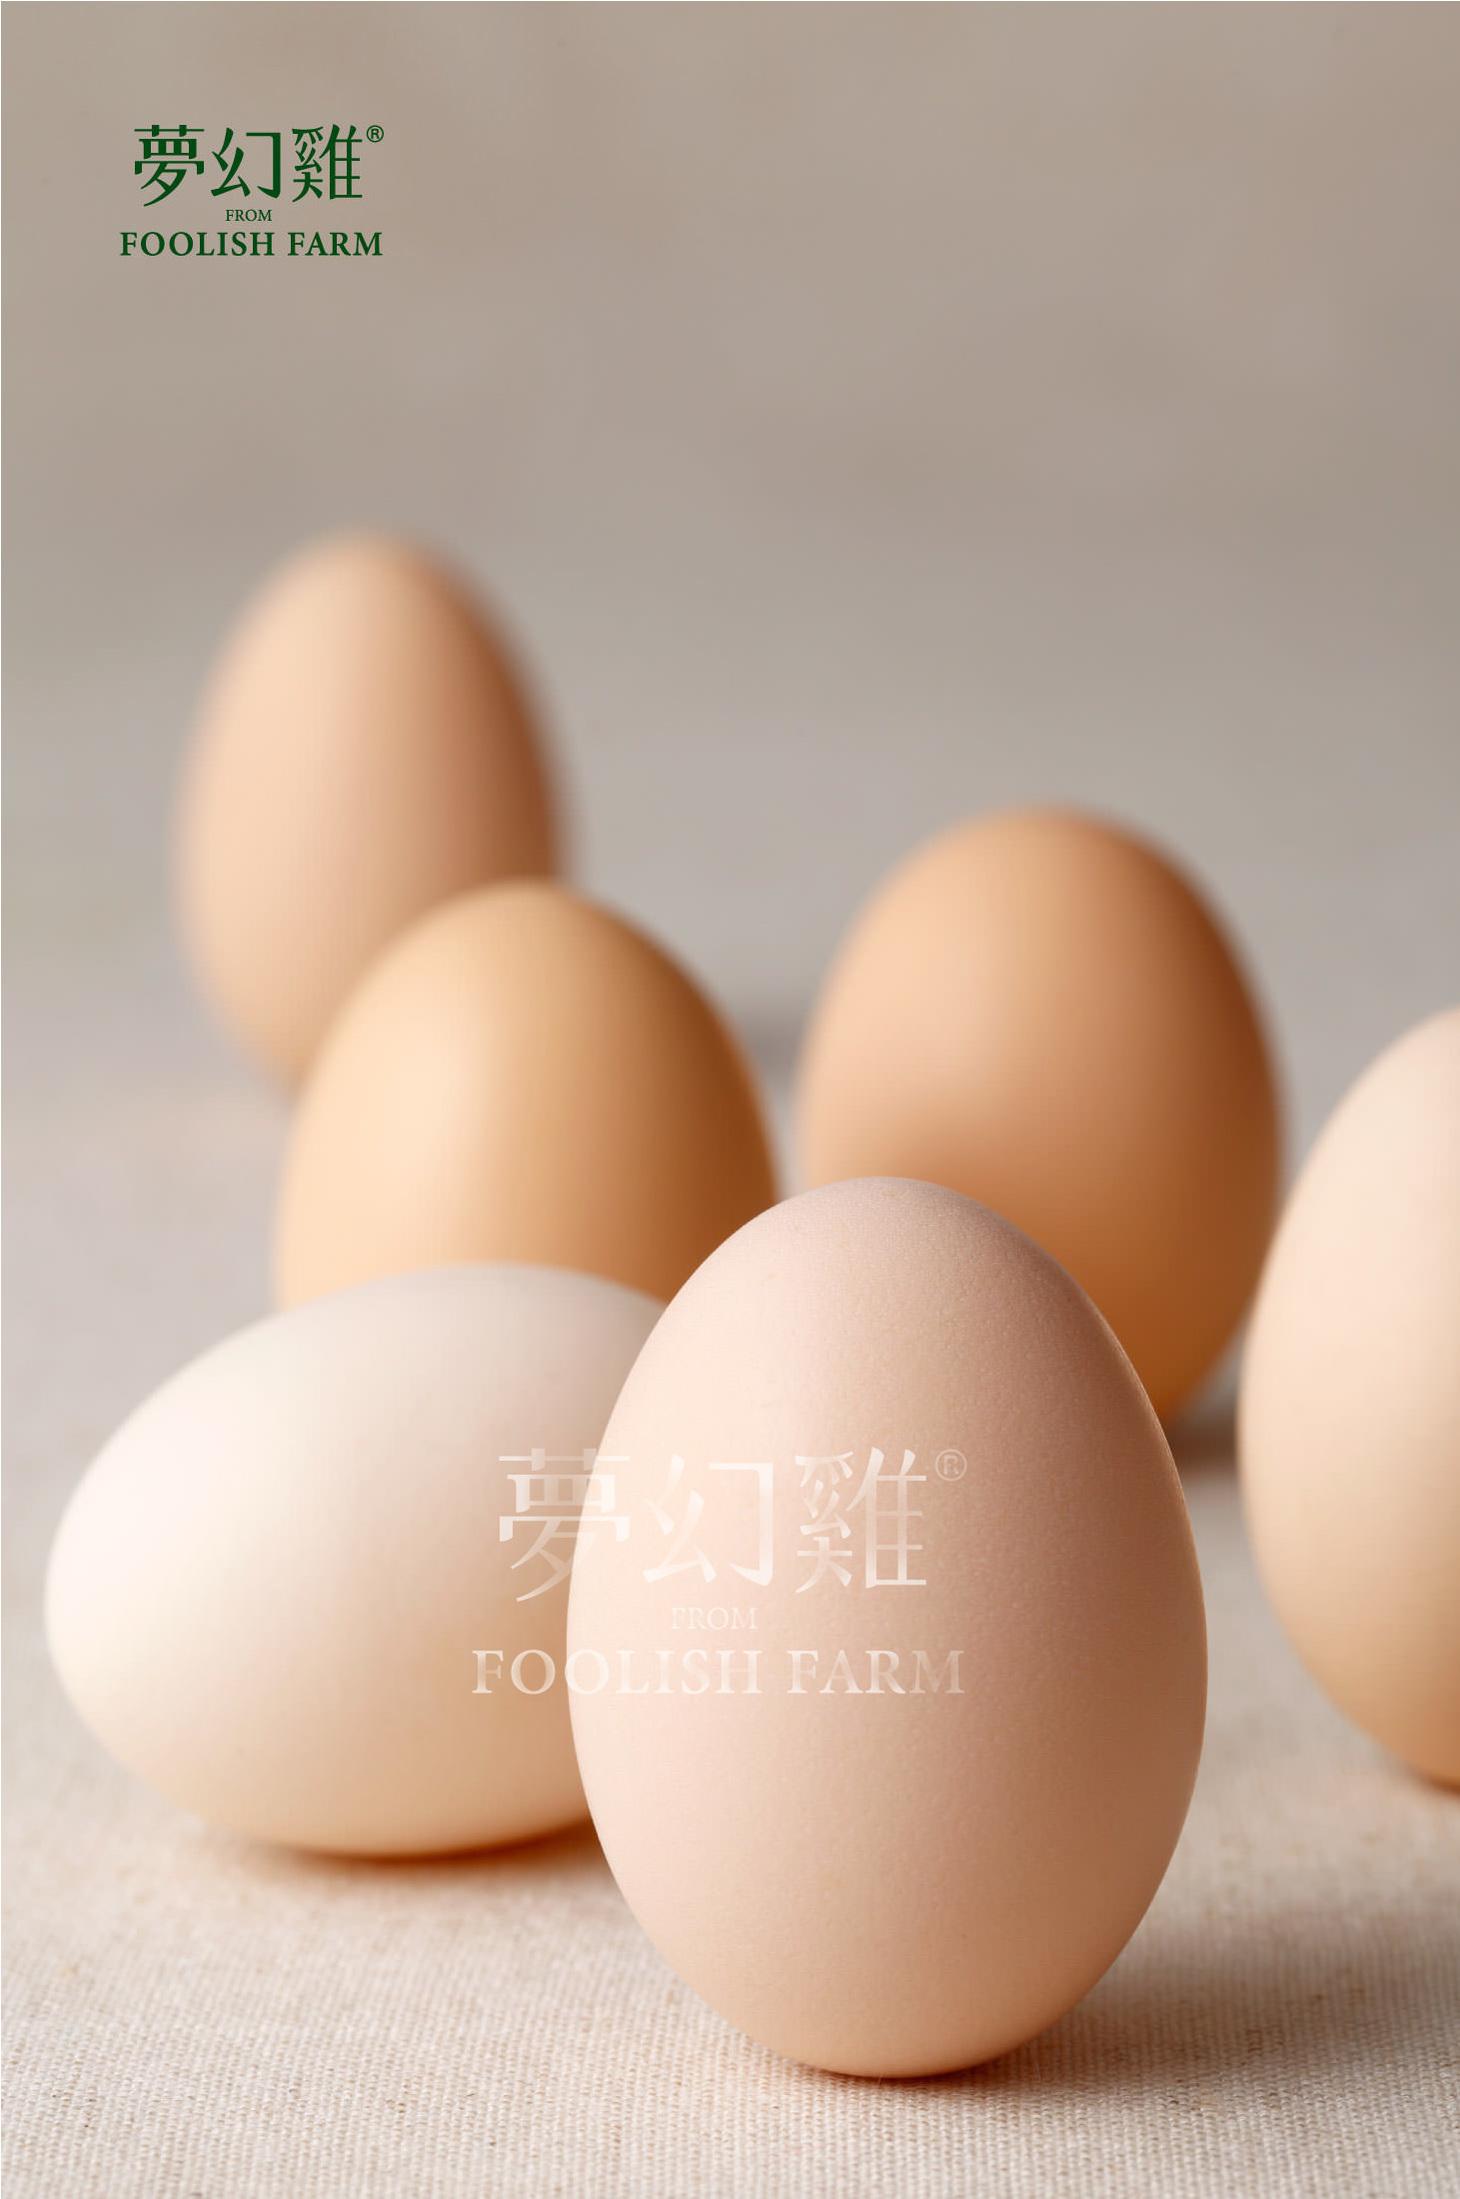 YUR_愚人農場_photo_20150217_1-1.jpg